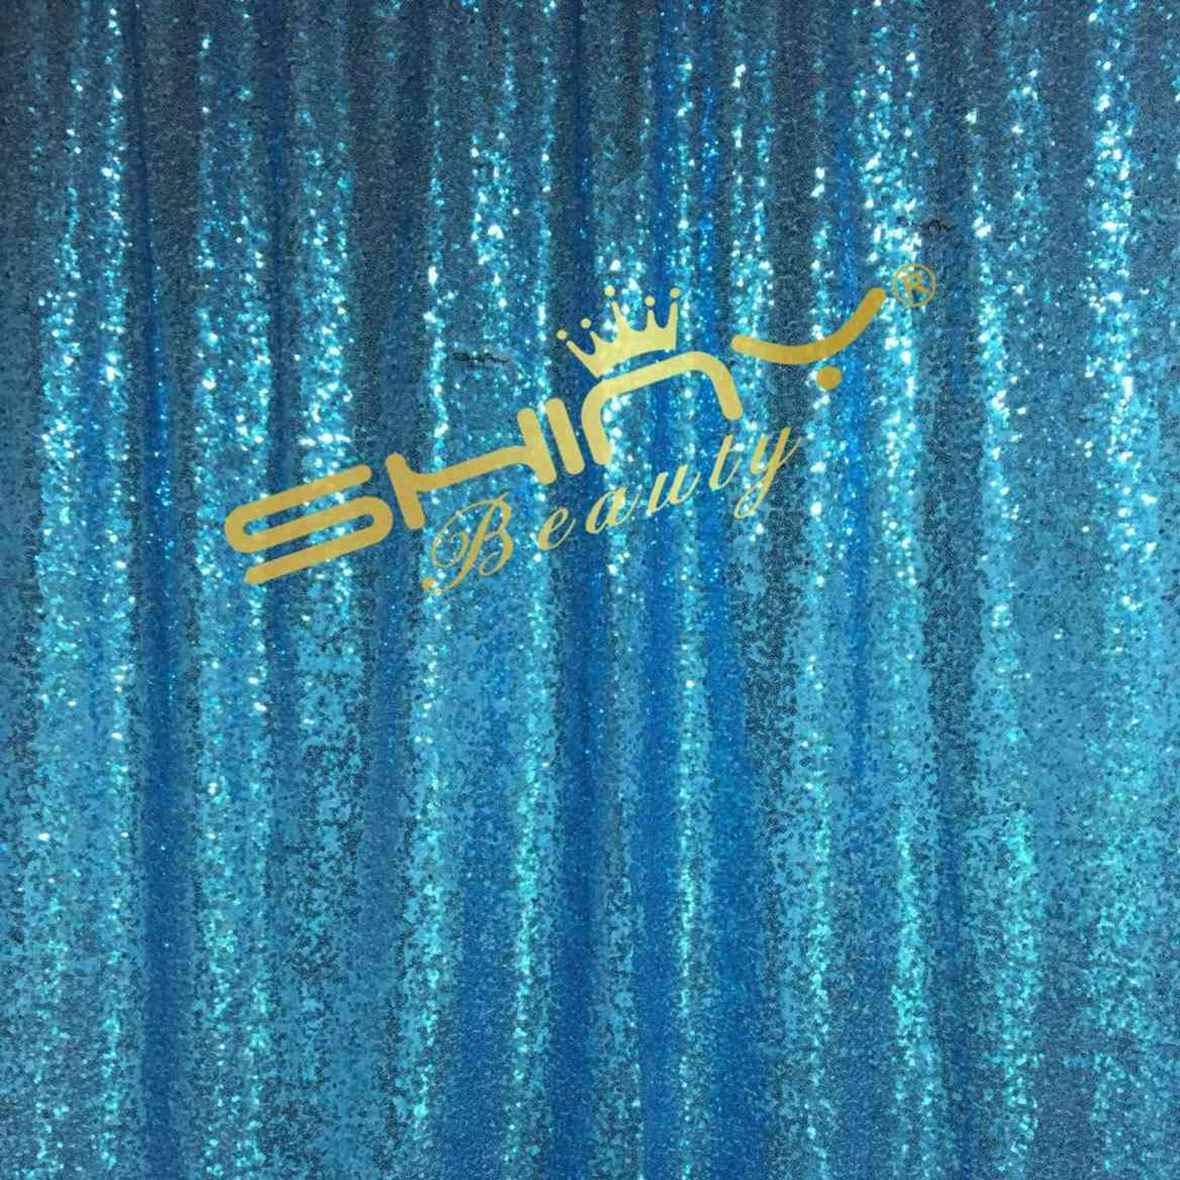 ShinyBeauty スパンコール背景カーテン 20フィートx10フィート スパンコール背景幕 AQU スパンコール写真背景幕 ターコイズスパークル写真背景幕 Y1121   B07KQWF625